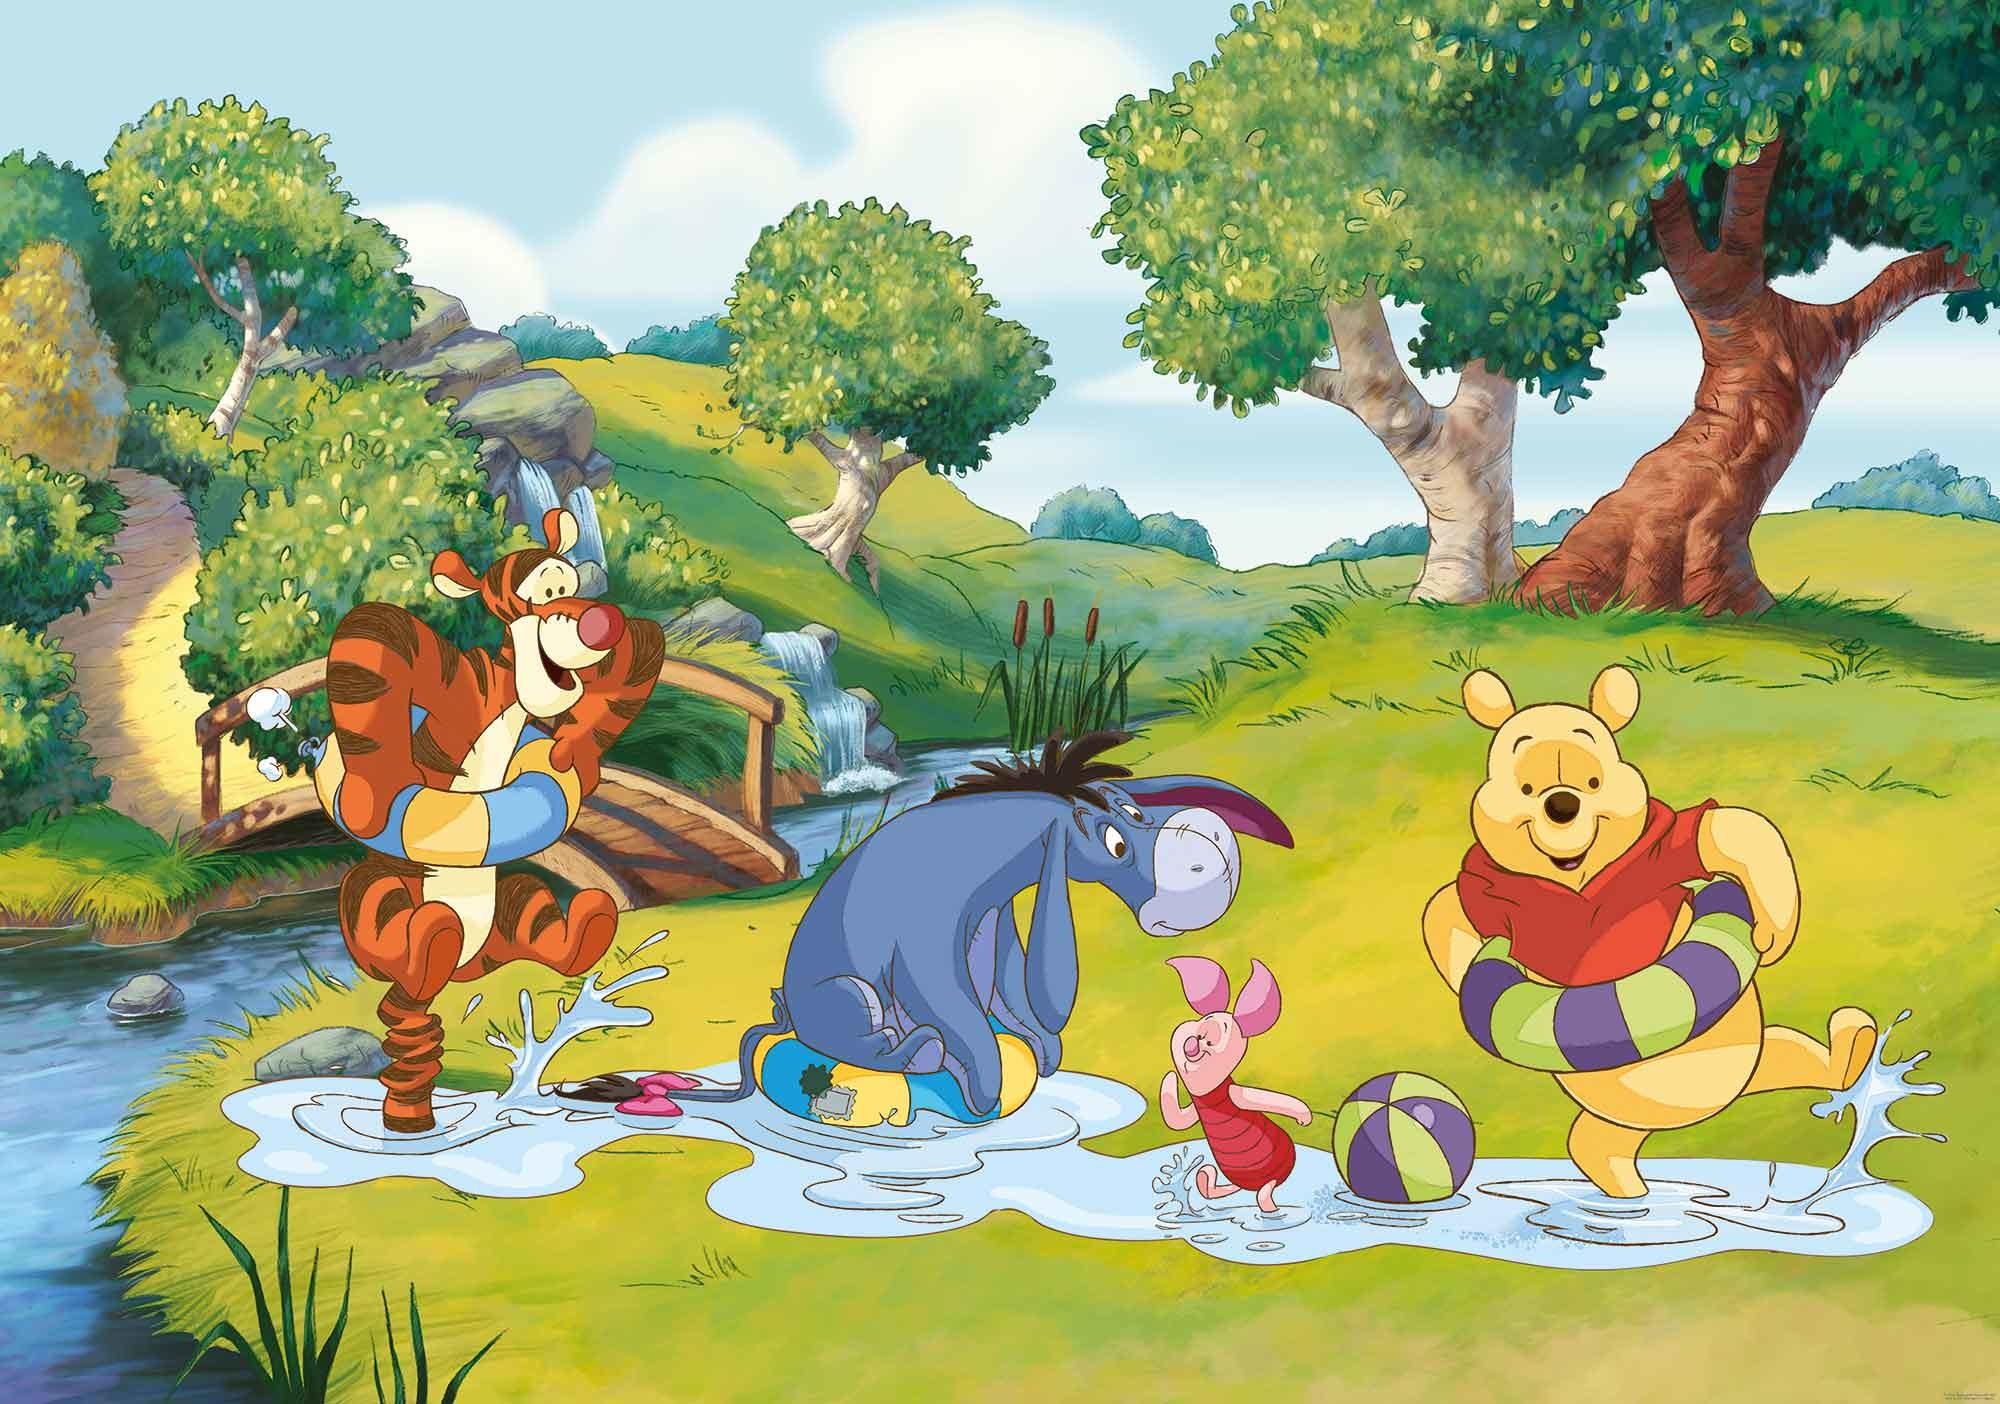 Res: 2000x1404, Disney Winnie Pooh Tigger Eeyore Piglet Photo Wallpaper Mural (808WM) -  Photo Wallpaper Murals - Catalogue - Consalnet Partner Portal